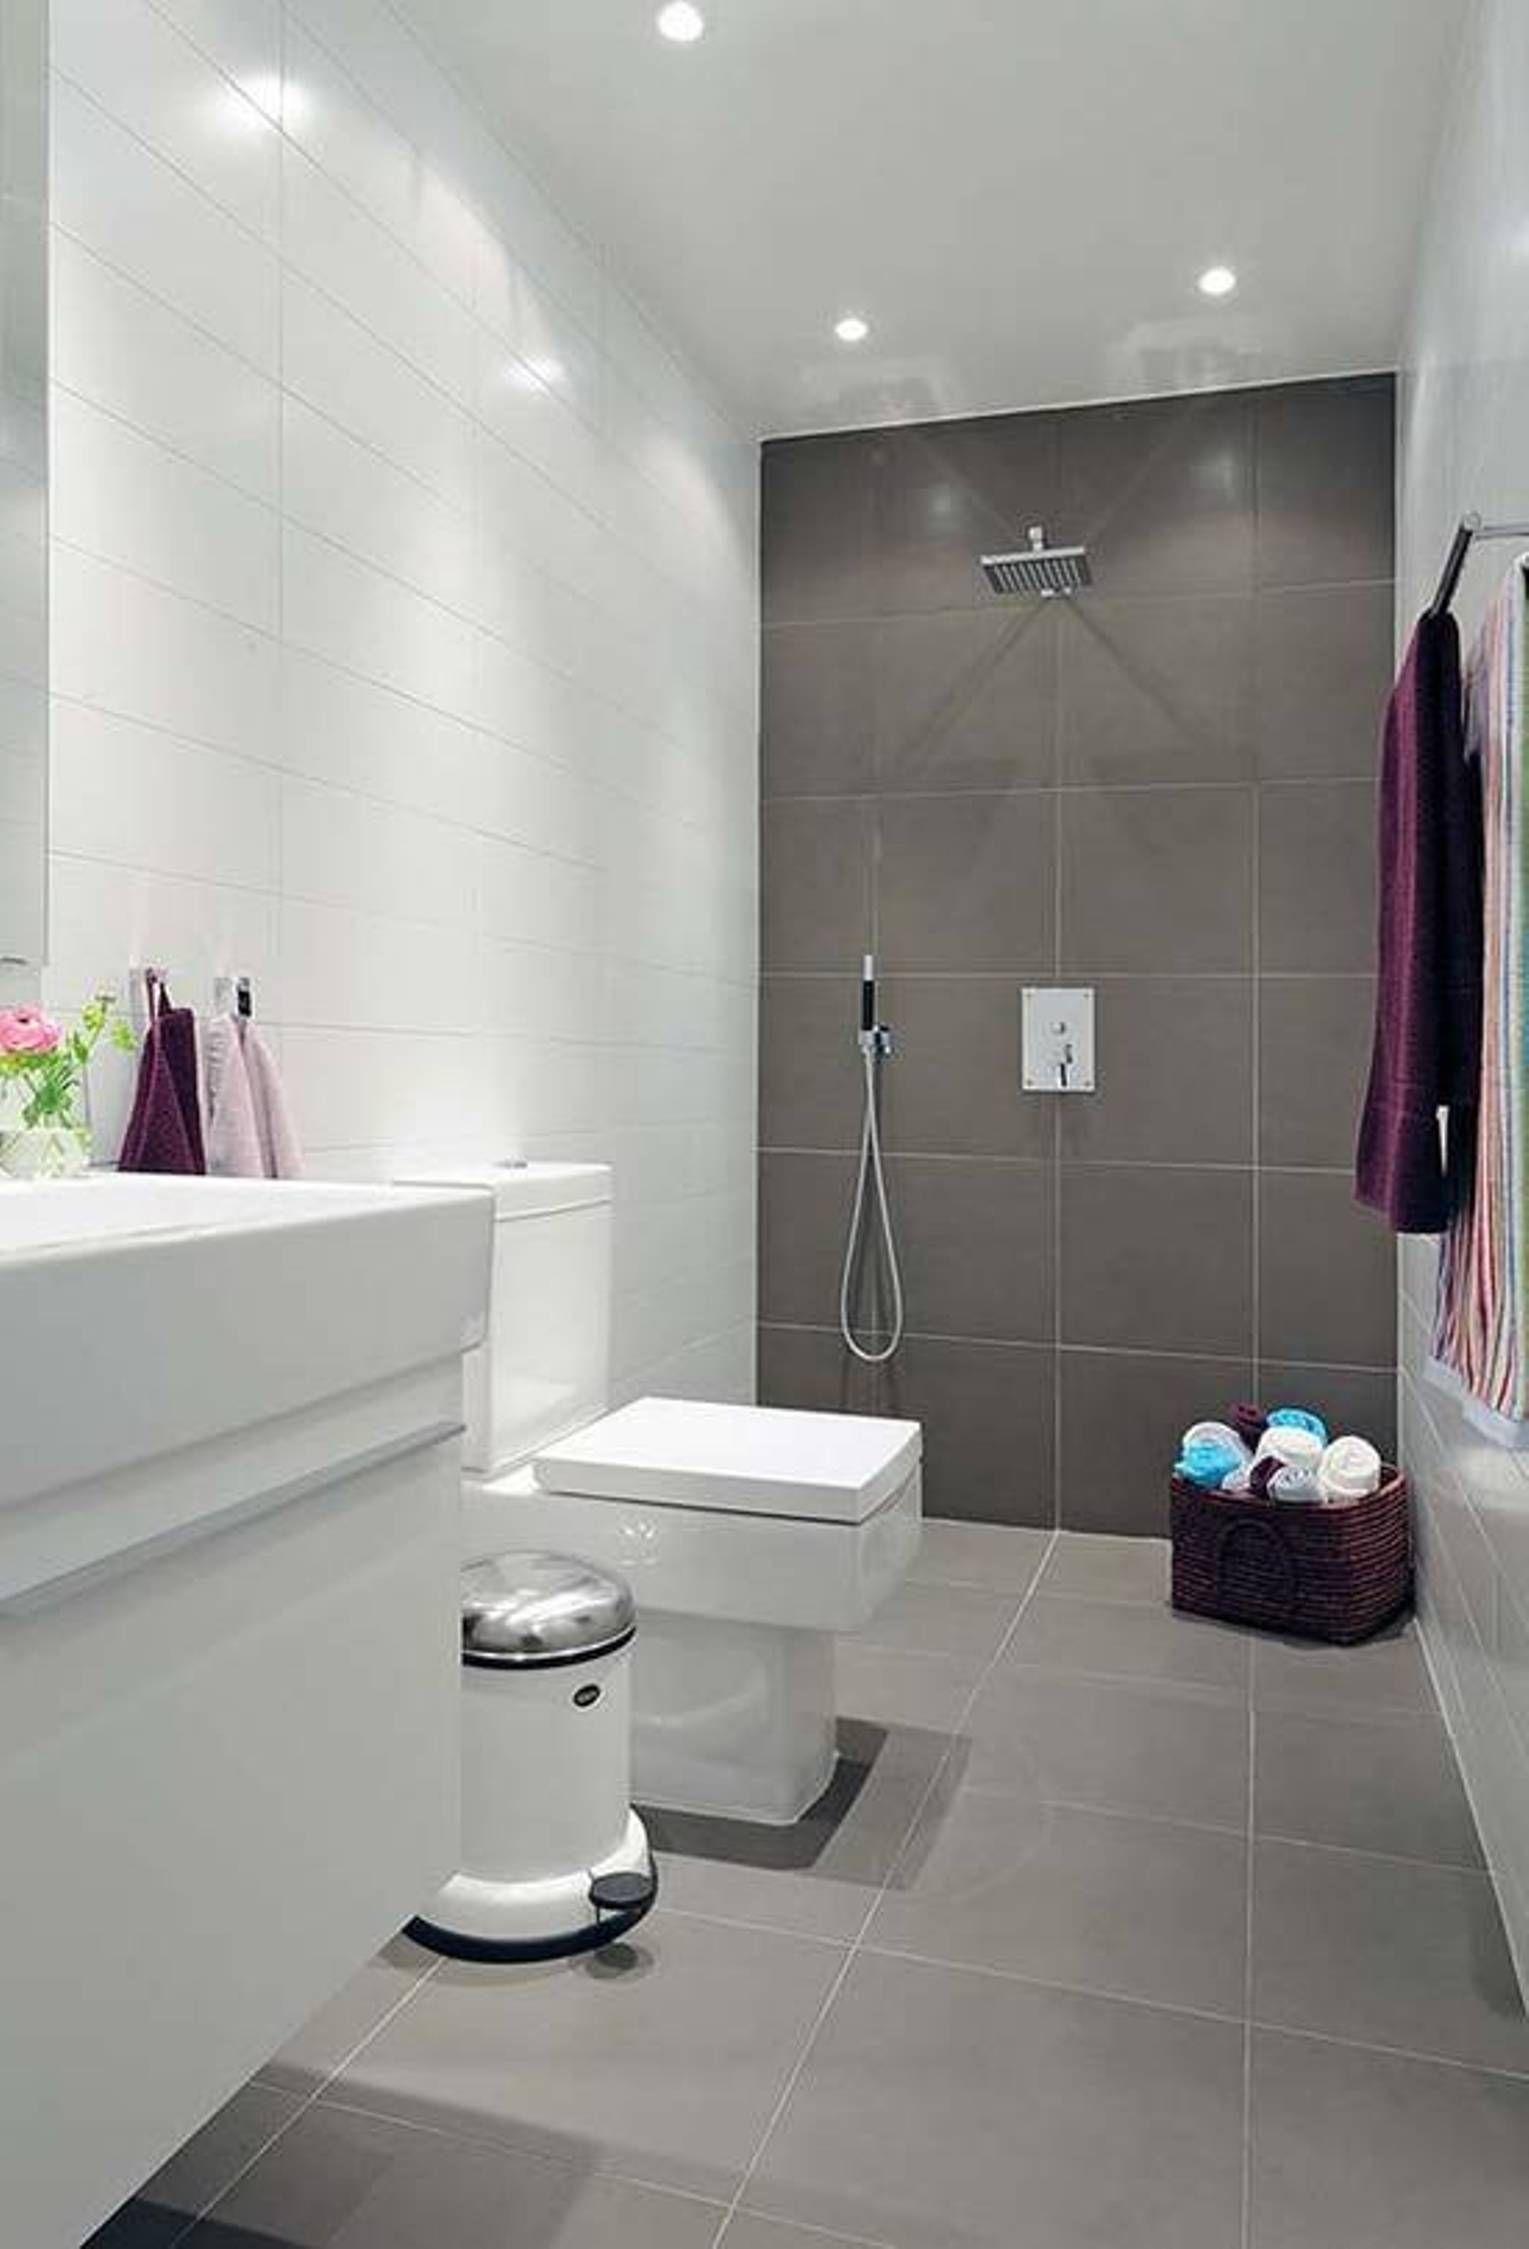 26 Vast Classy And Modern Bathroom Shower Tile Ideas Simple Bathroom Simple Bathroom Designs Modern Bathroom Tile